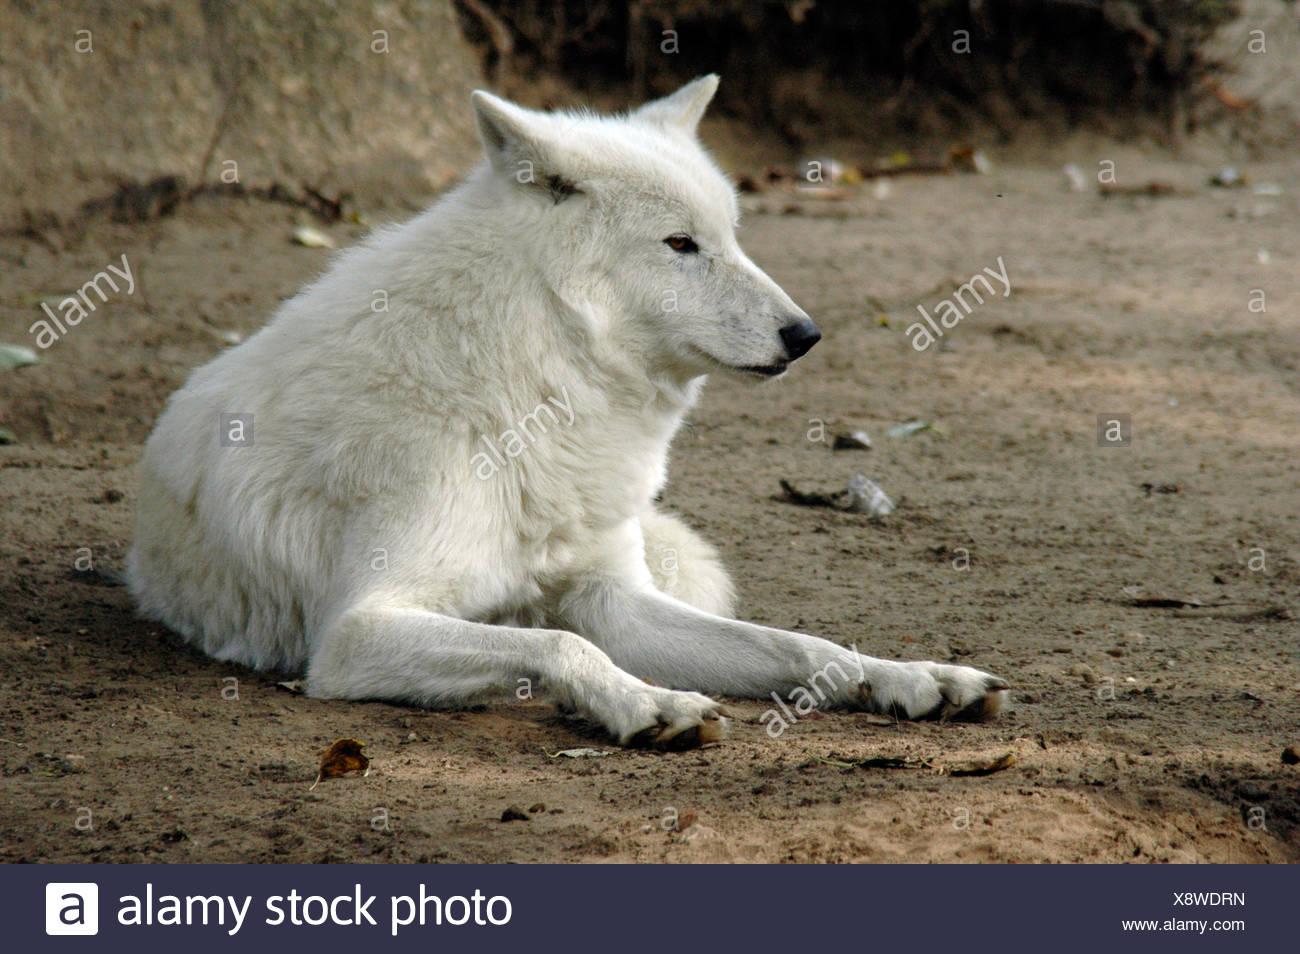 Graue Wölfe oder Timber Wolf (Canis Lupus), Zoo Berlin, Berlin, Deutschland, Europa Stockbild